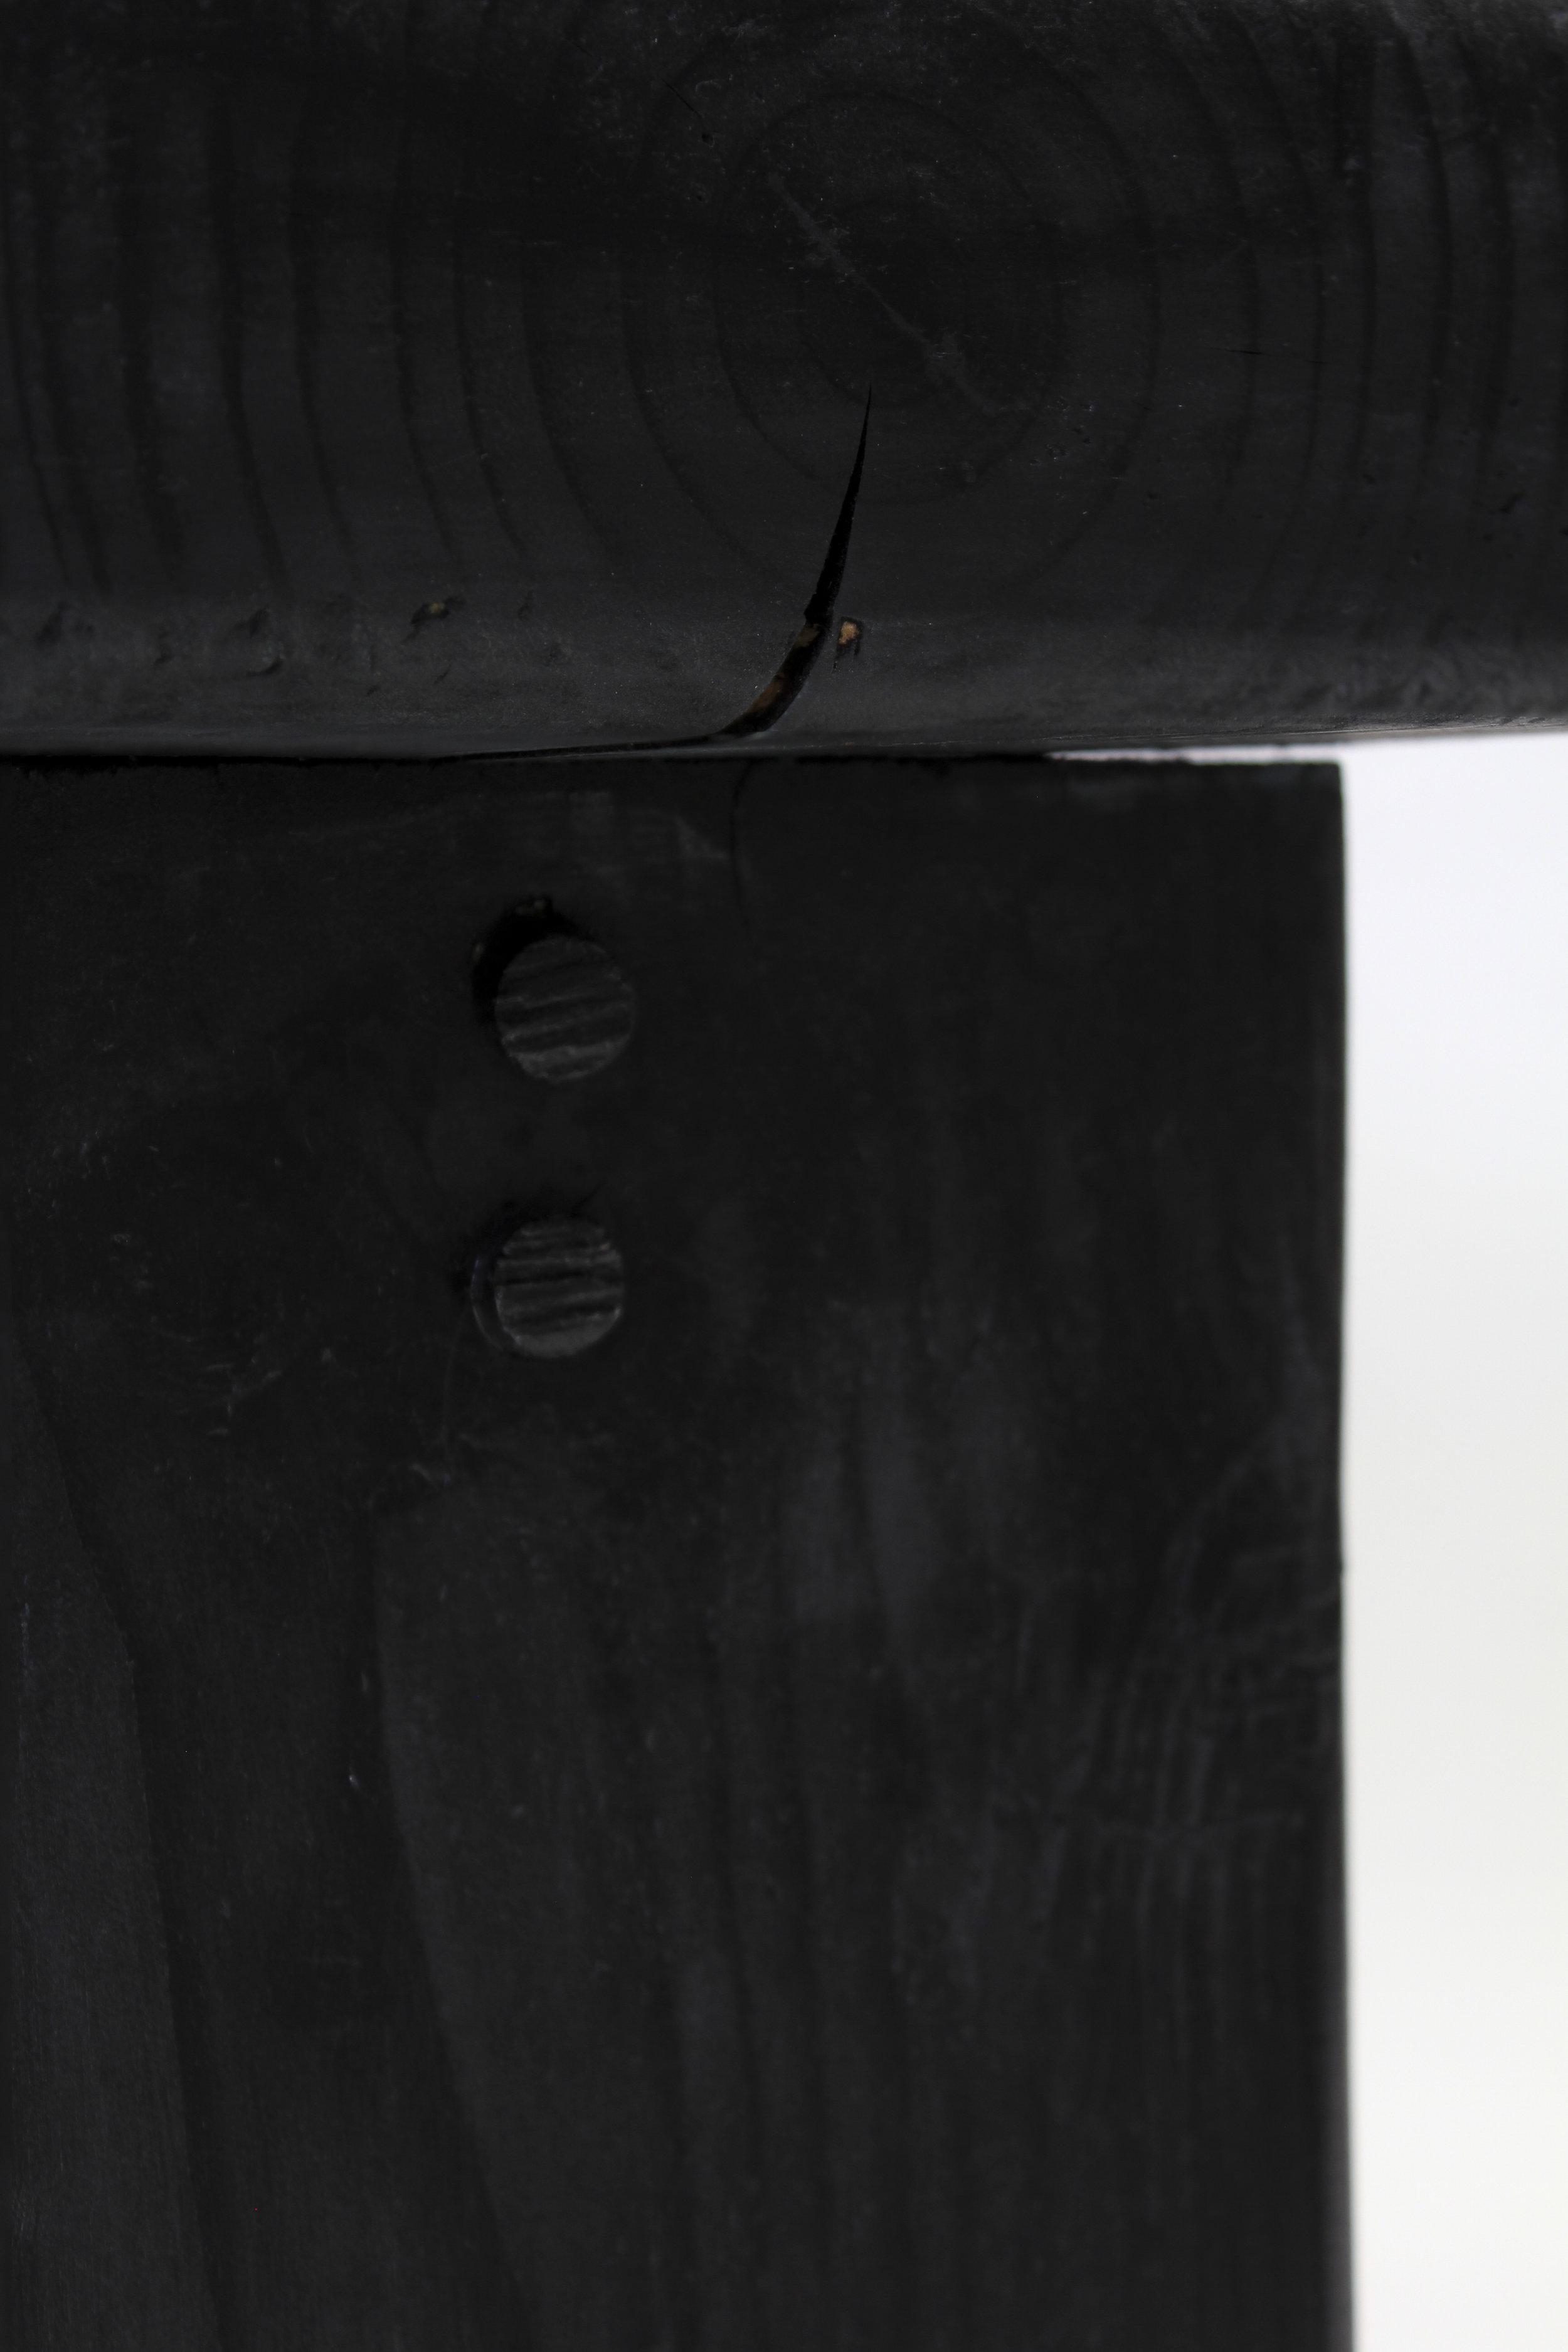 06-Benchees & Hooks_Lola-Lely_©IMMATTERS-06:19.jpg